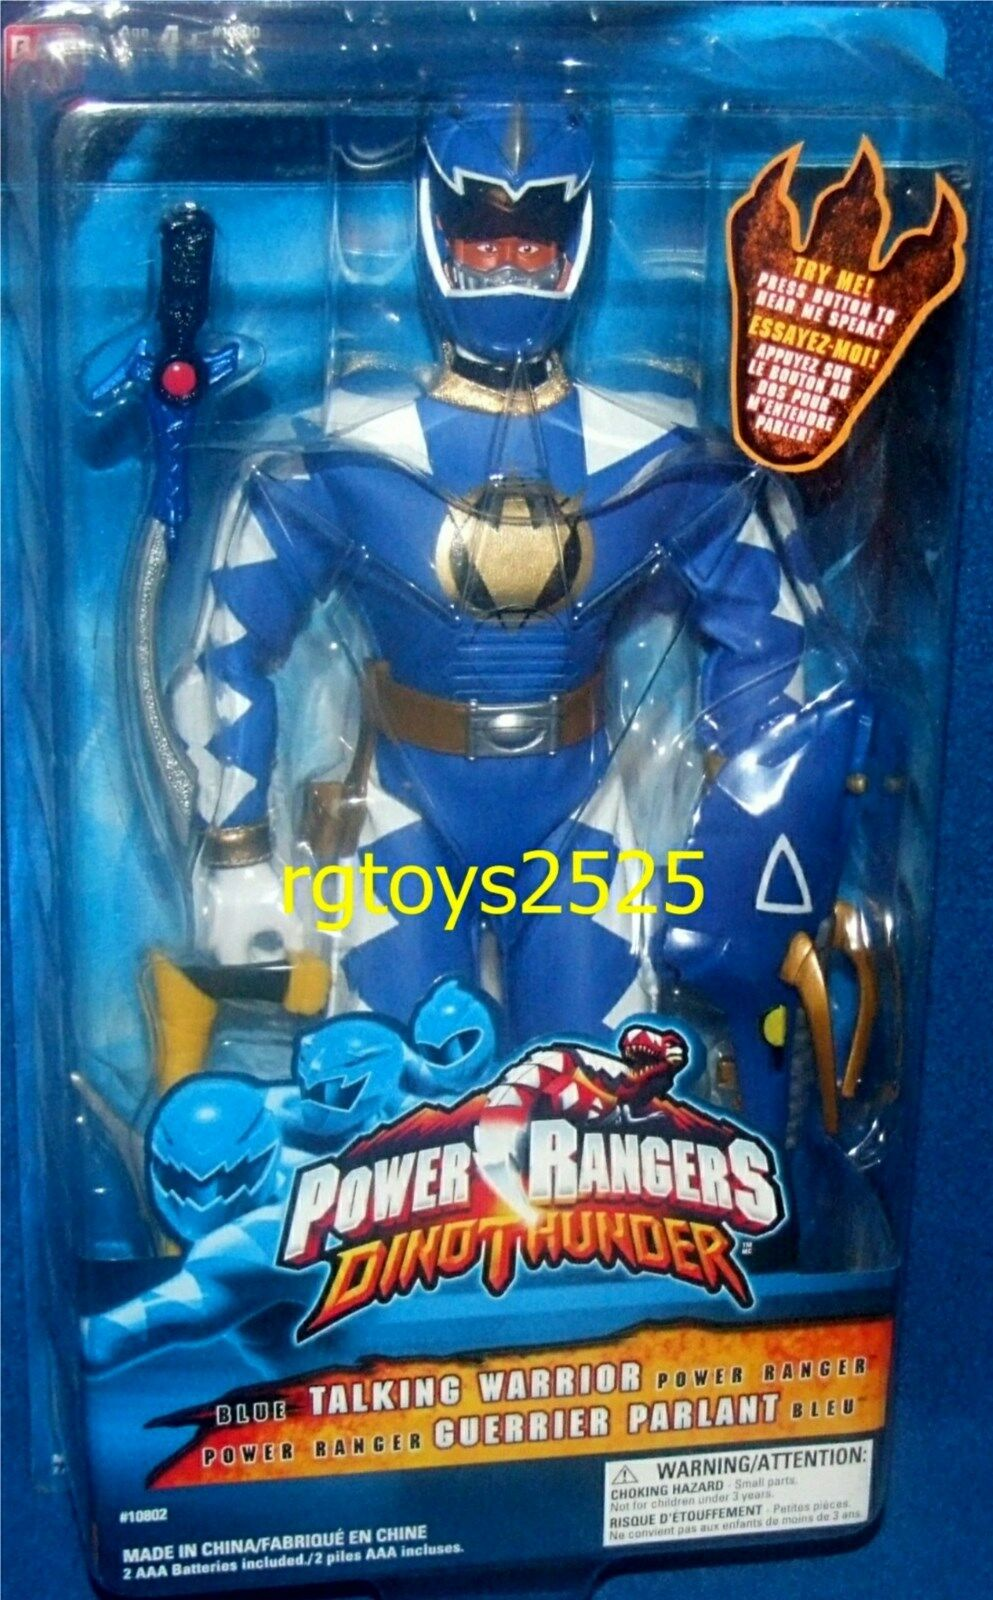 Power Rangers Dino Thunder Blau 12